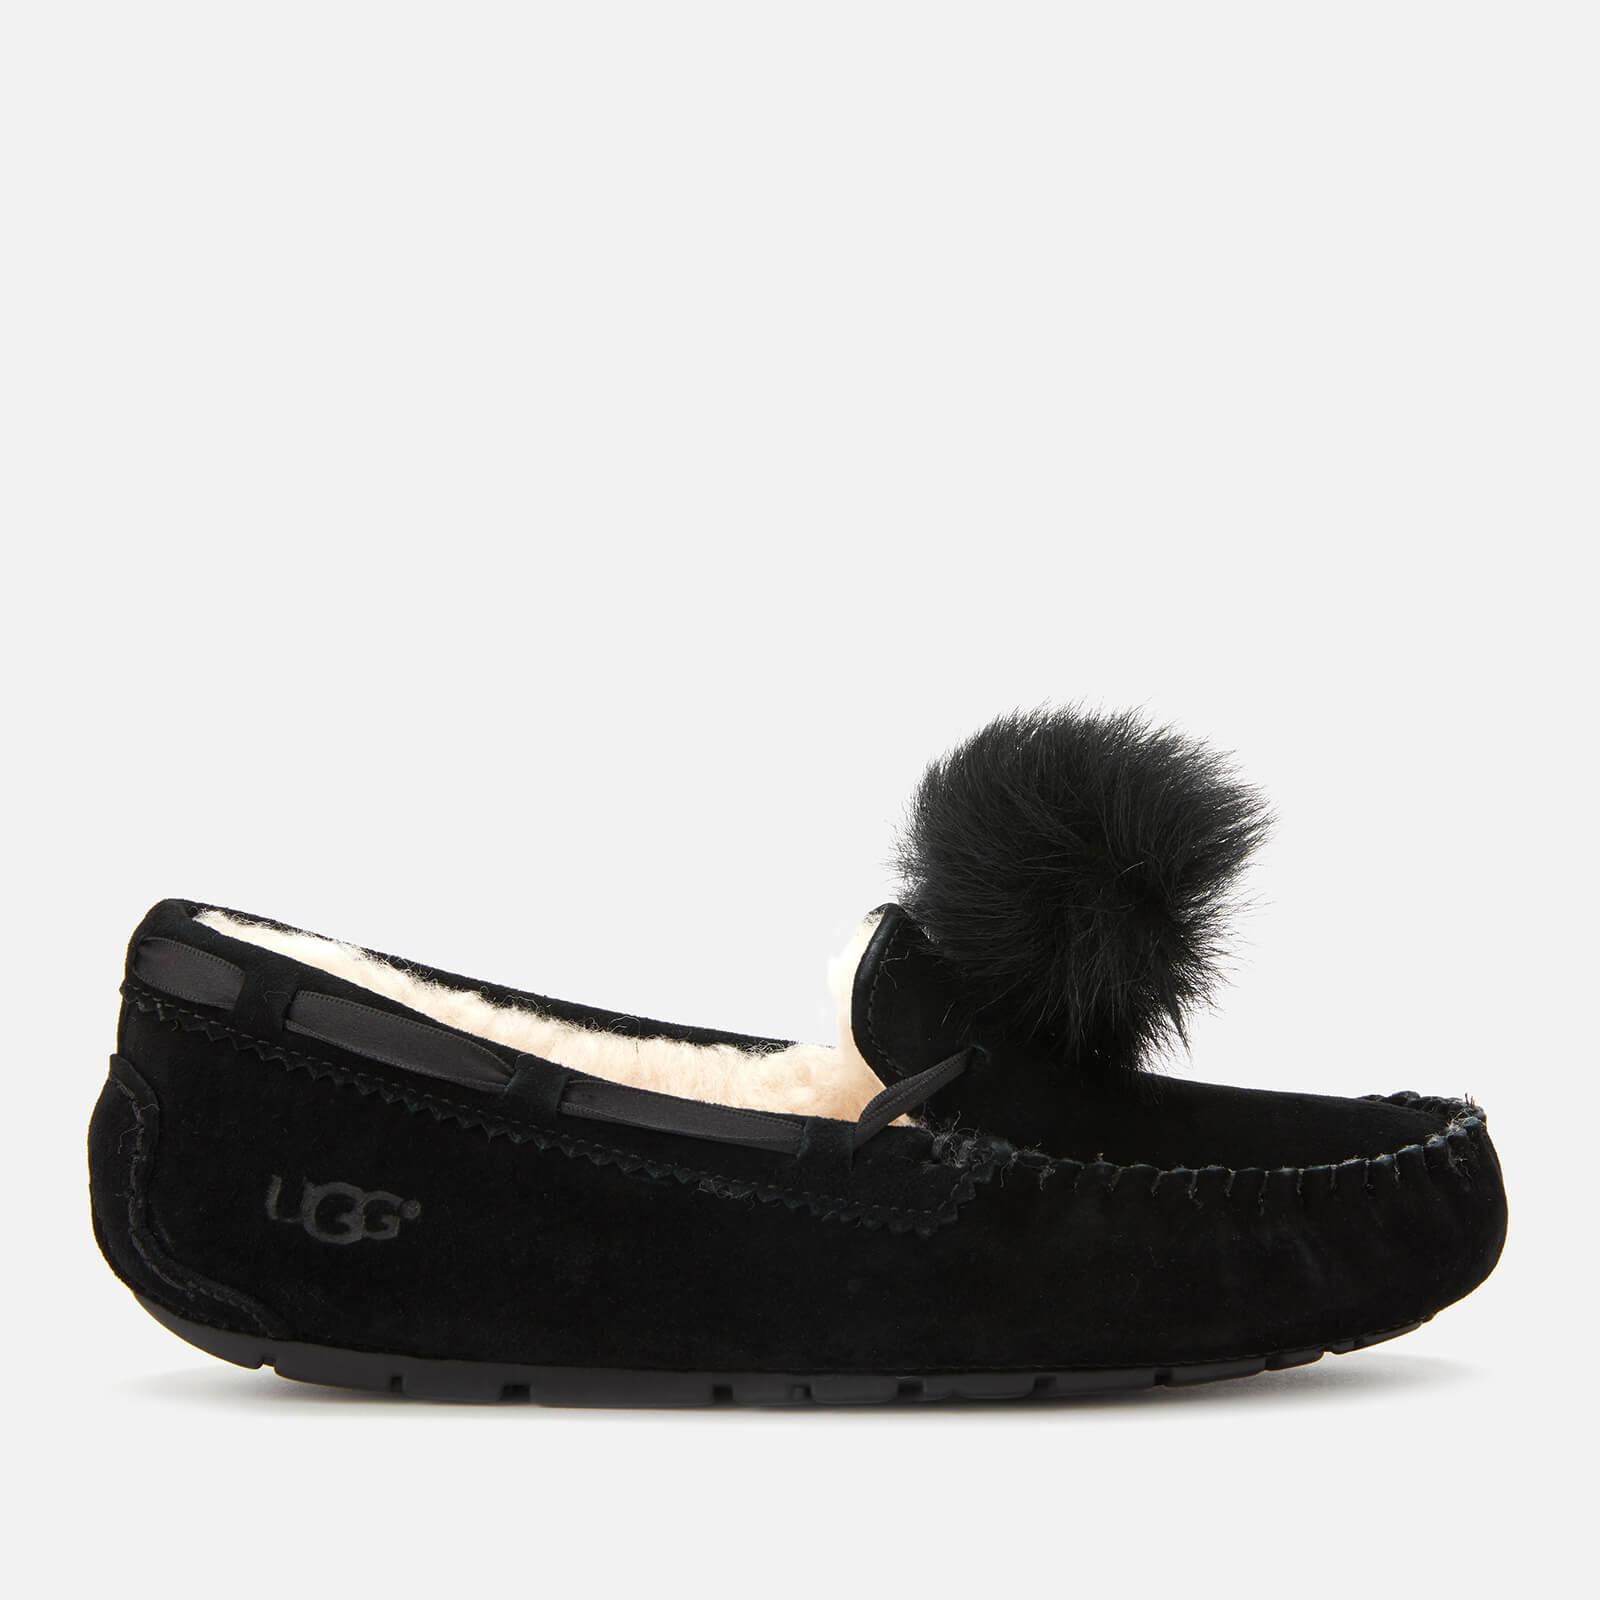 027383c9fc8 UGG Women's Dakota Pom Pom Moccasin Slippers - Black